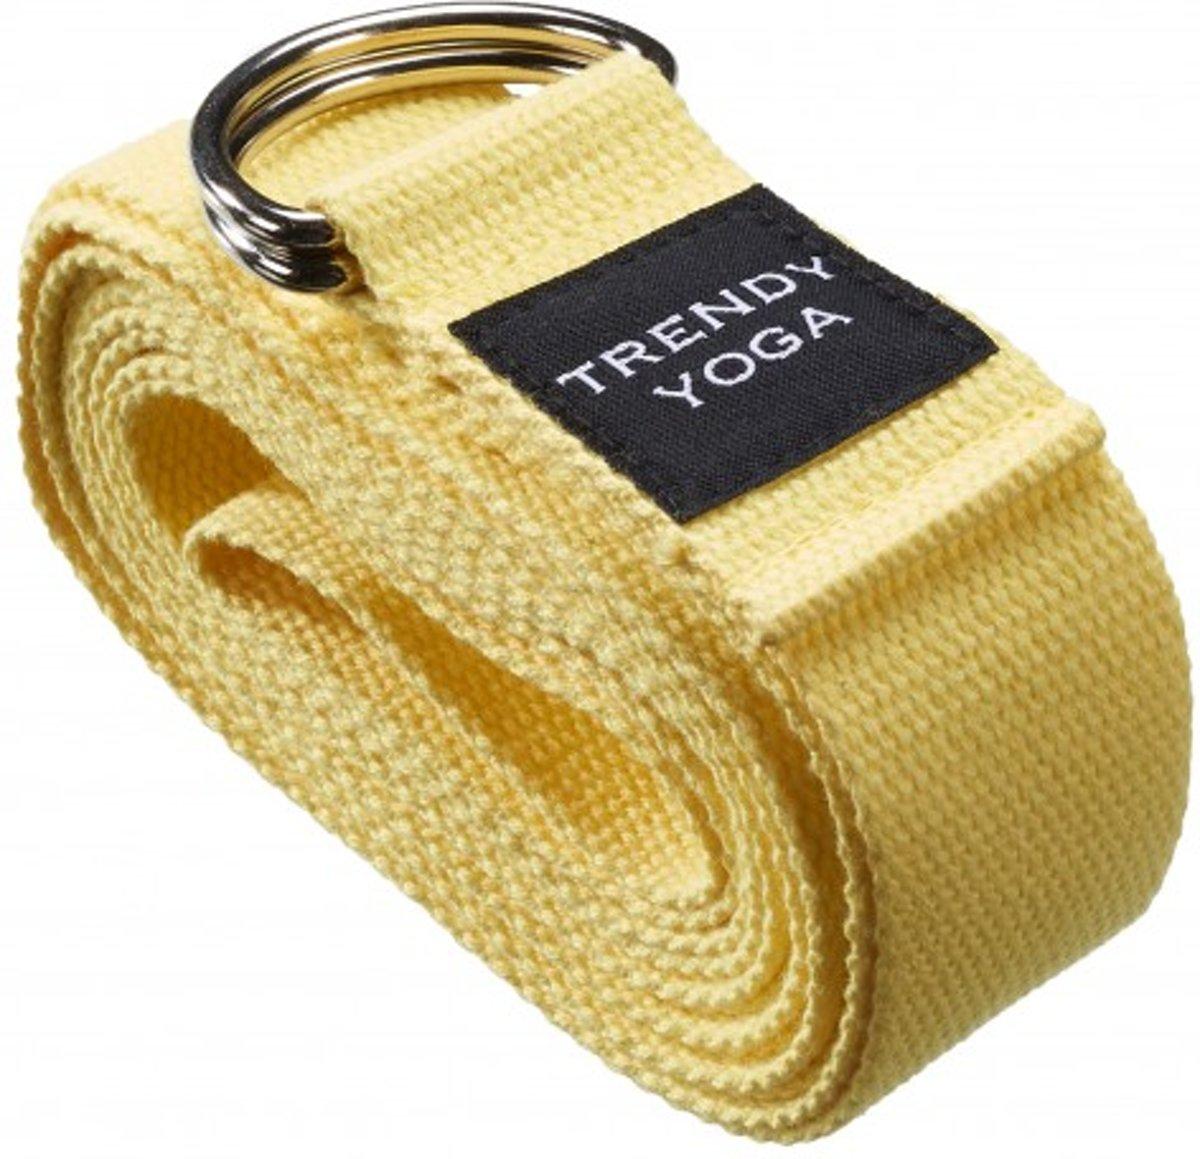 Trendy Sport Yoga riem - Yogariem - Yoga belt - 190 cm lang - 4 cm breed - 2 mm dik - Geel kopen